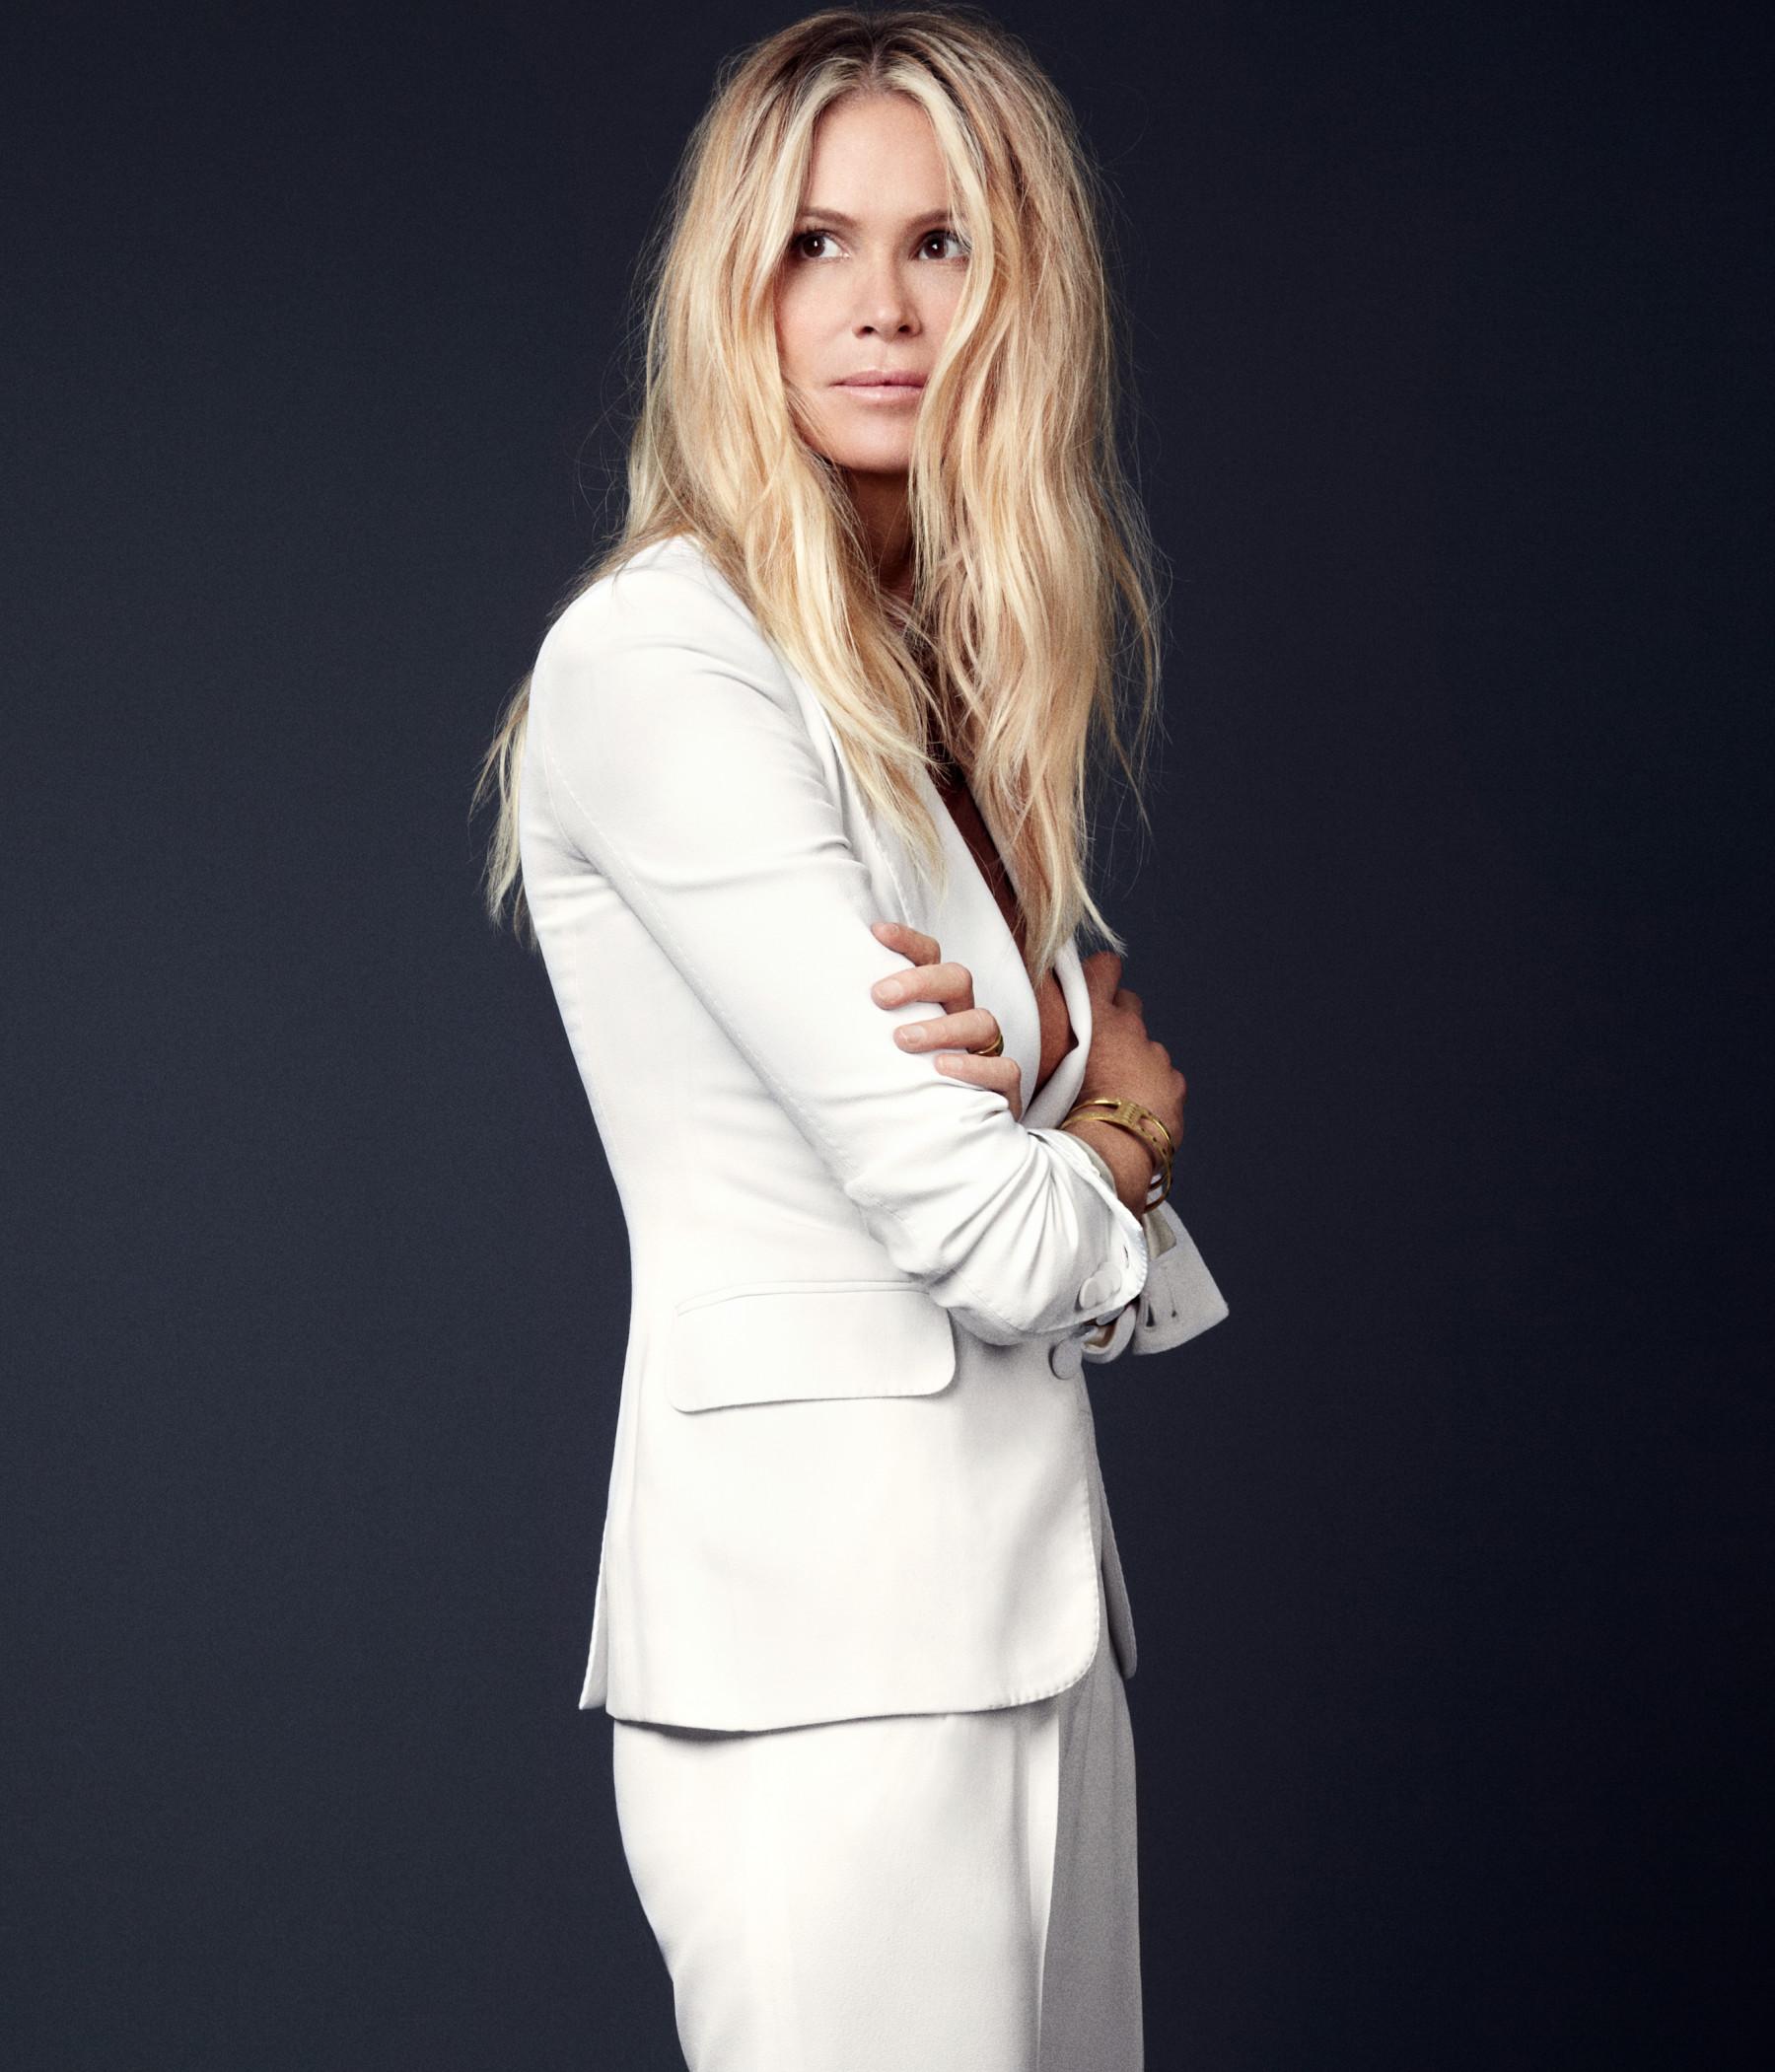 white jacket - Elle email